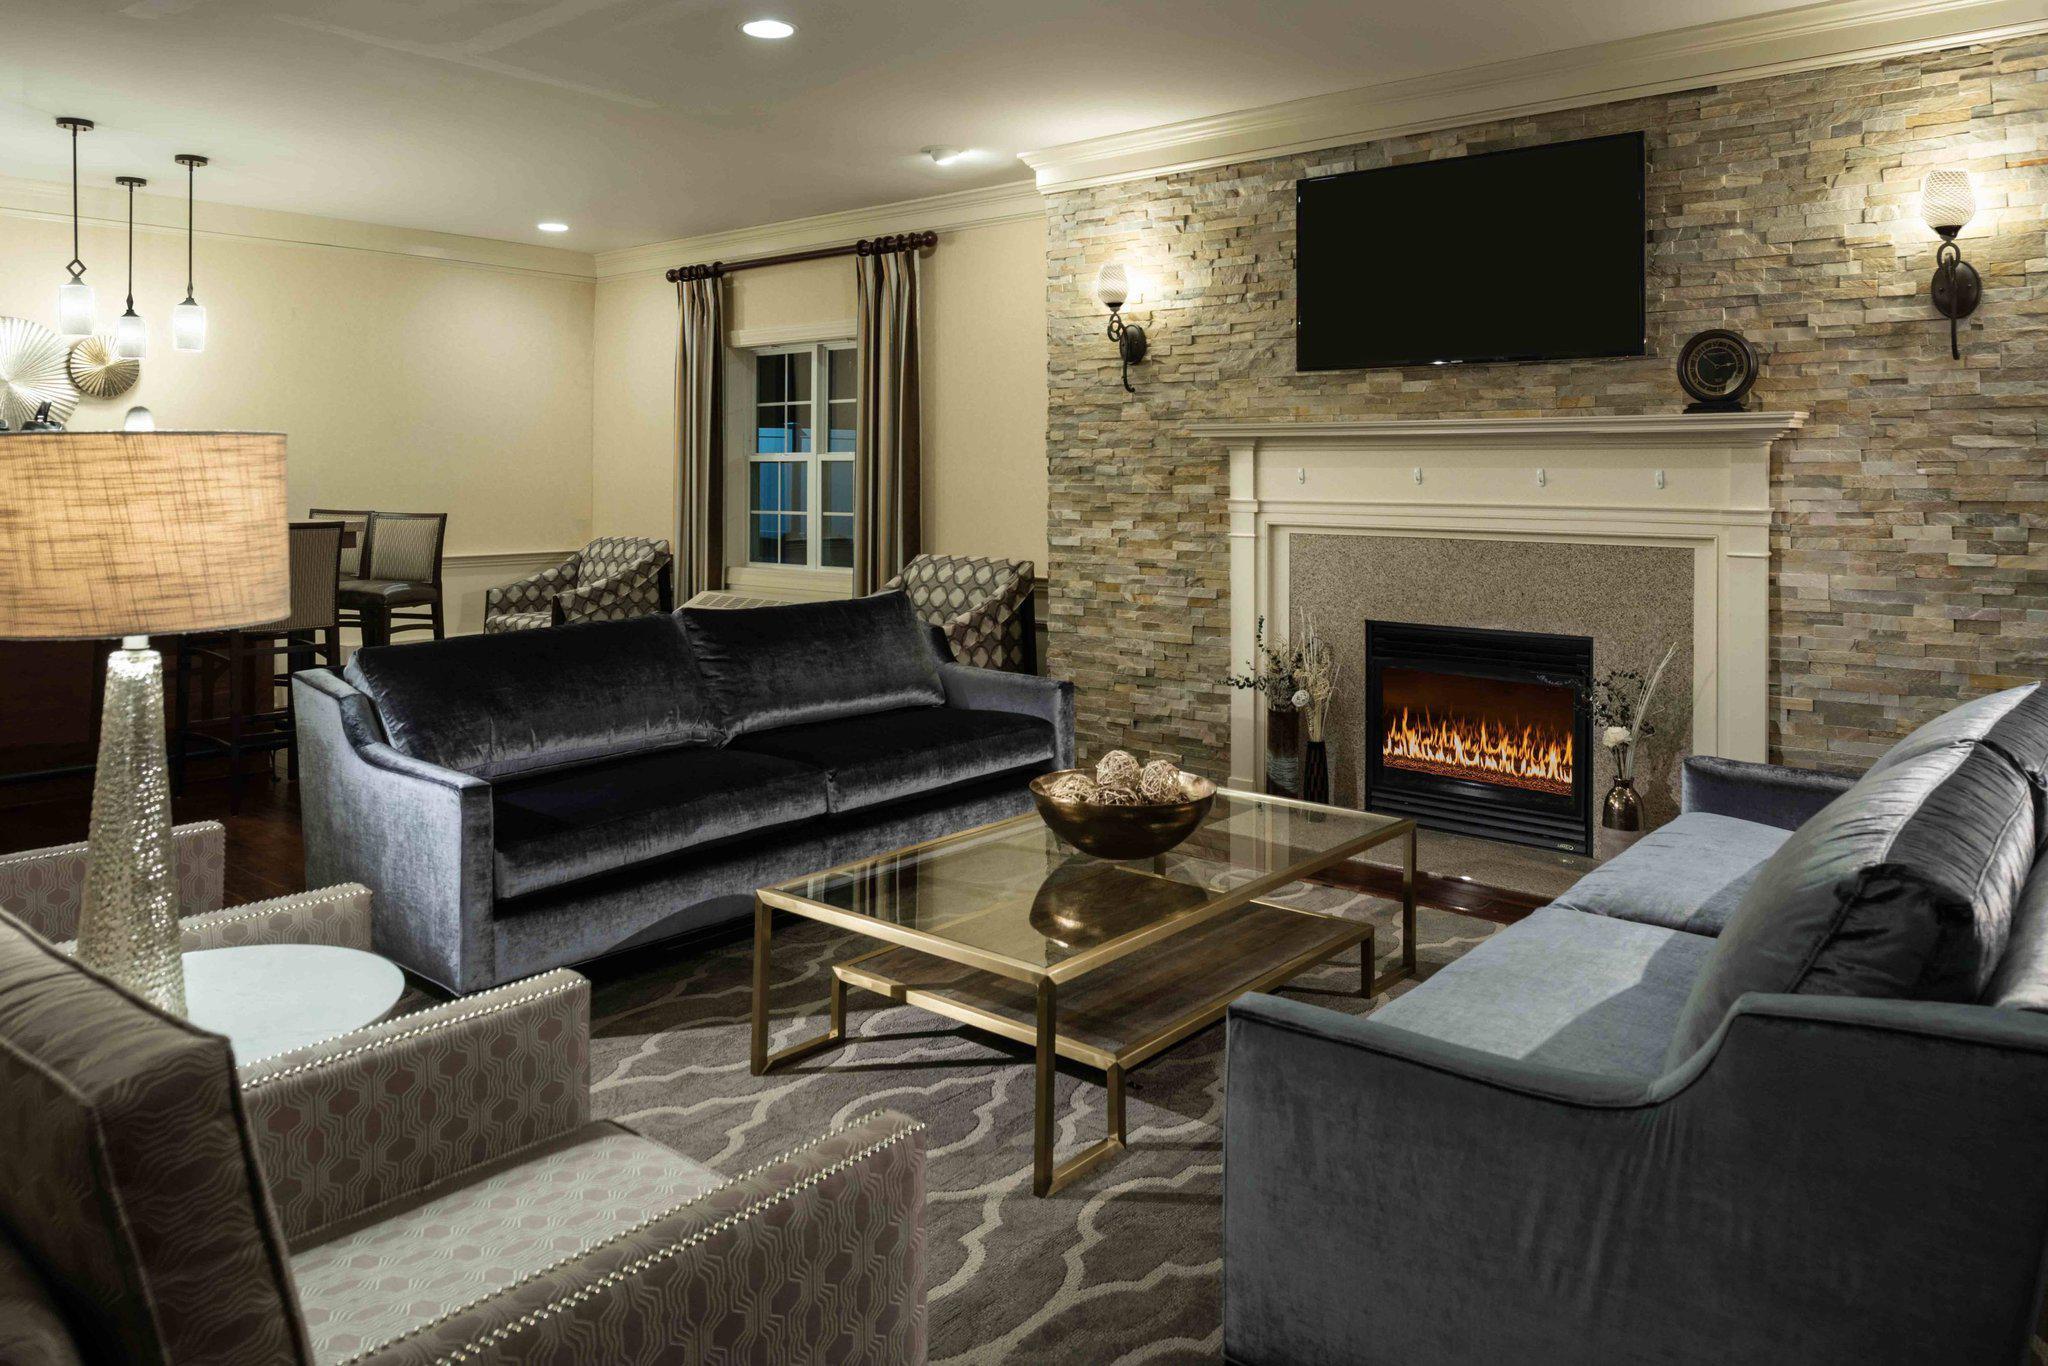 Fairfield Inn by Marriott Boston Sudbury